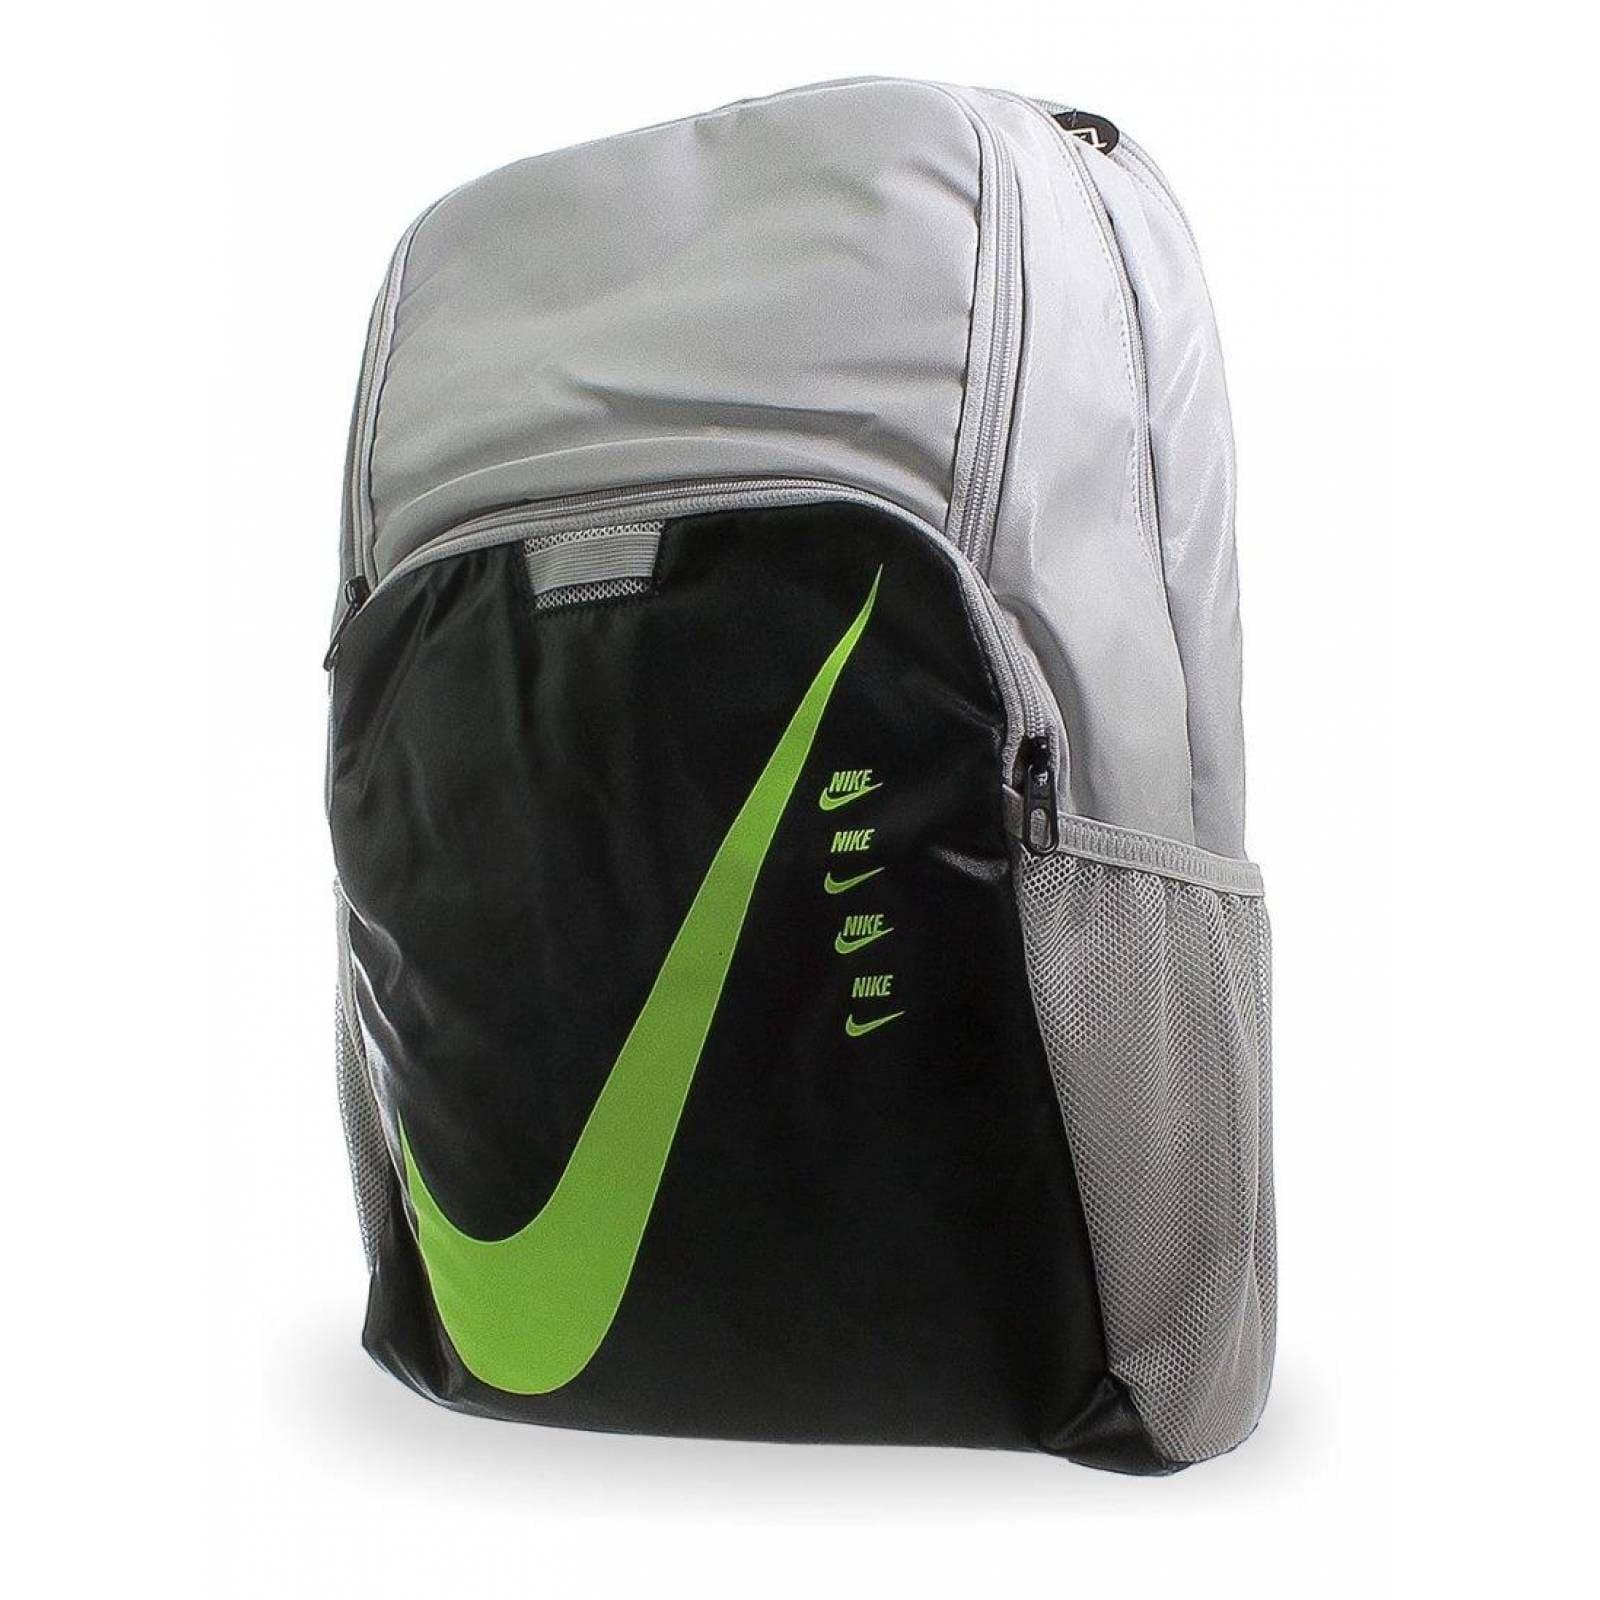 ladrar Paralizar romántico  Mochila Nike Original Brasilia 9.0 Back Pack XL. BA6214-028